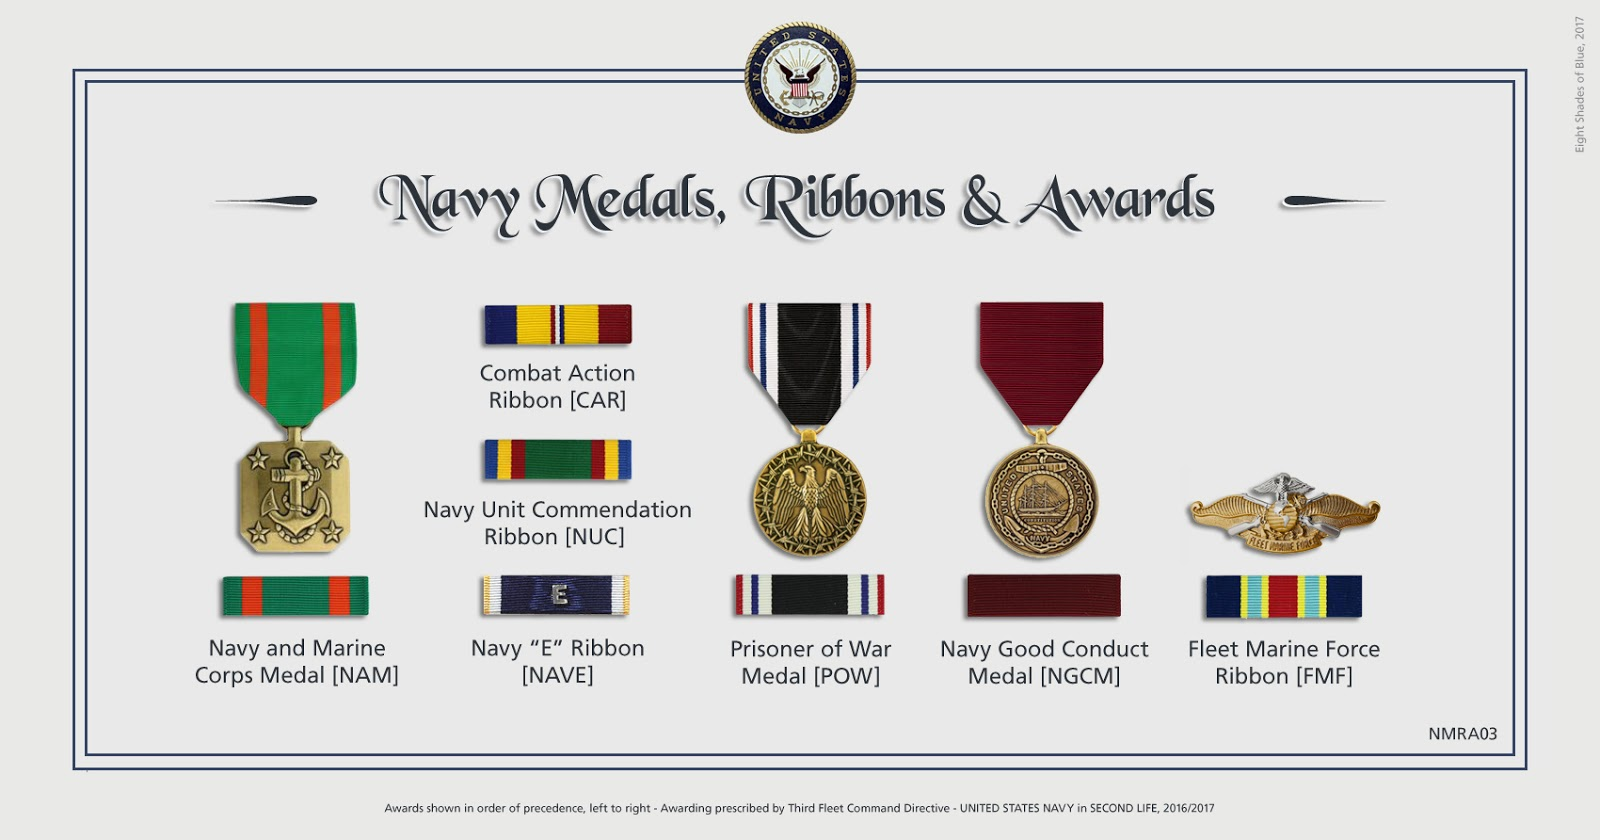 N A S  Miramar NFWS / SL: Medals and Awards of Third Fleet - Navy